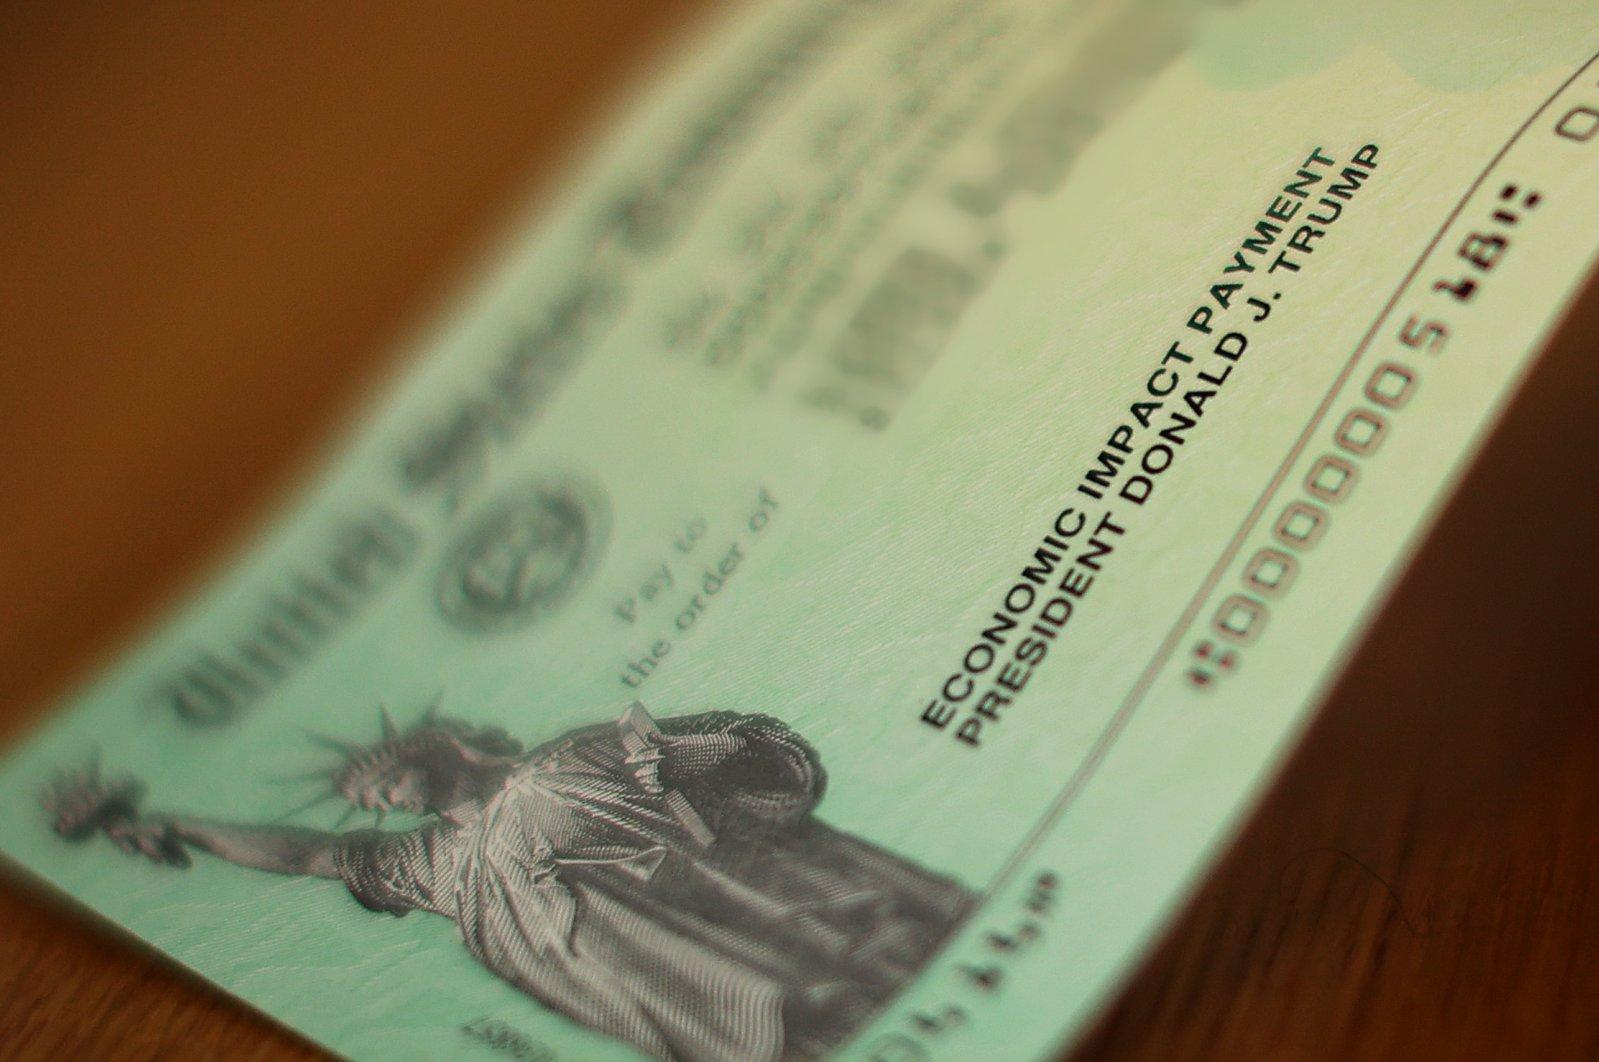 U.S. President Donald Trump's name appears on the coronavirus economic assistance checks that were sent to citizens across the country, Washington, D.C., April 29, 2020. (AFP Photo)